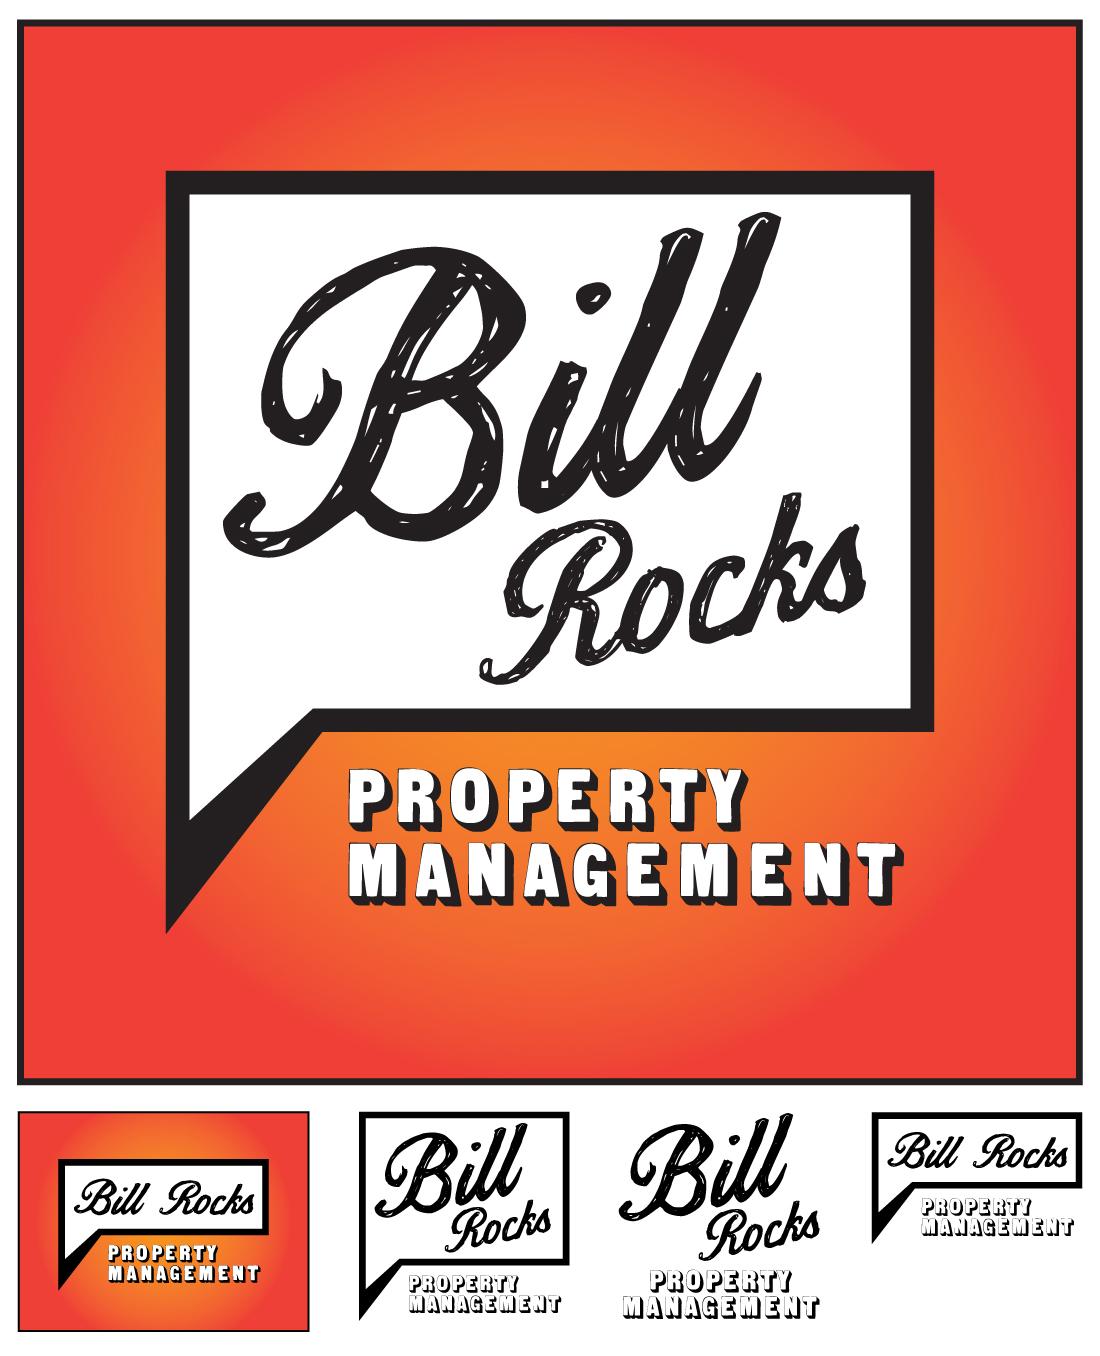 Bill Rocks Property Management